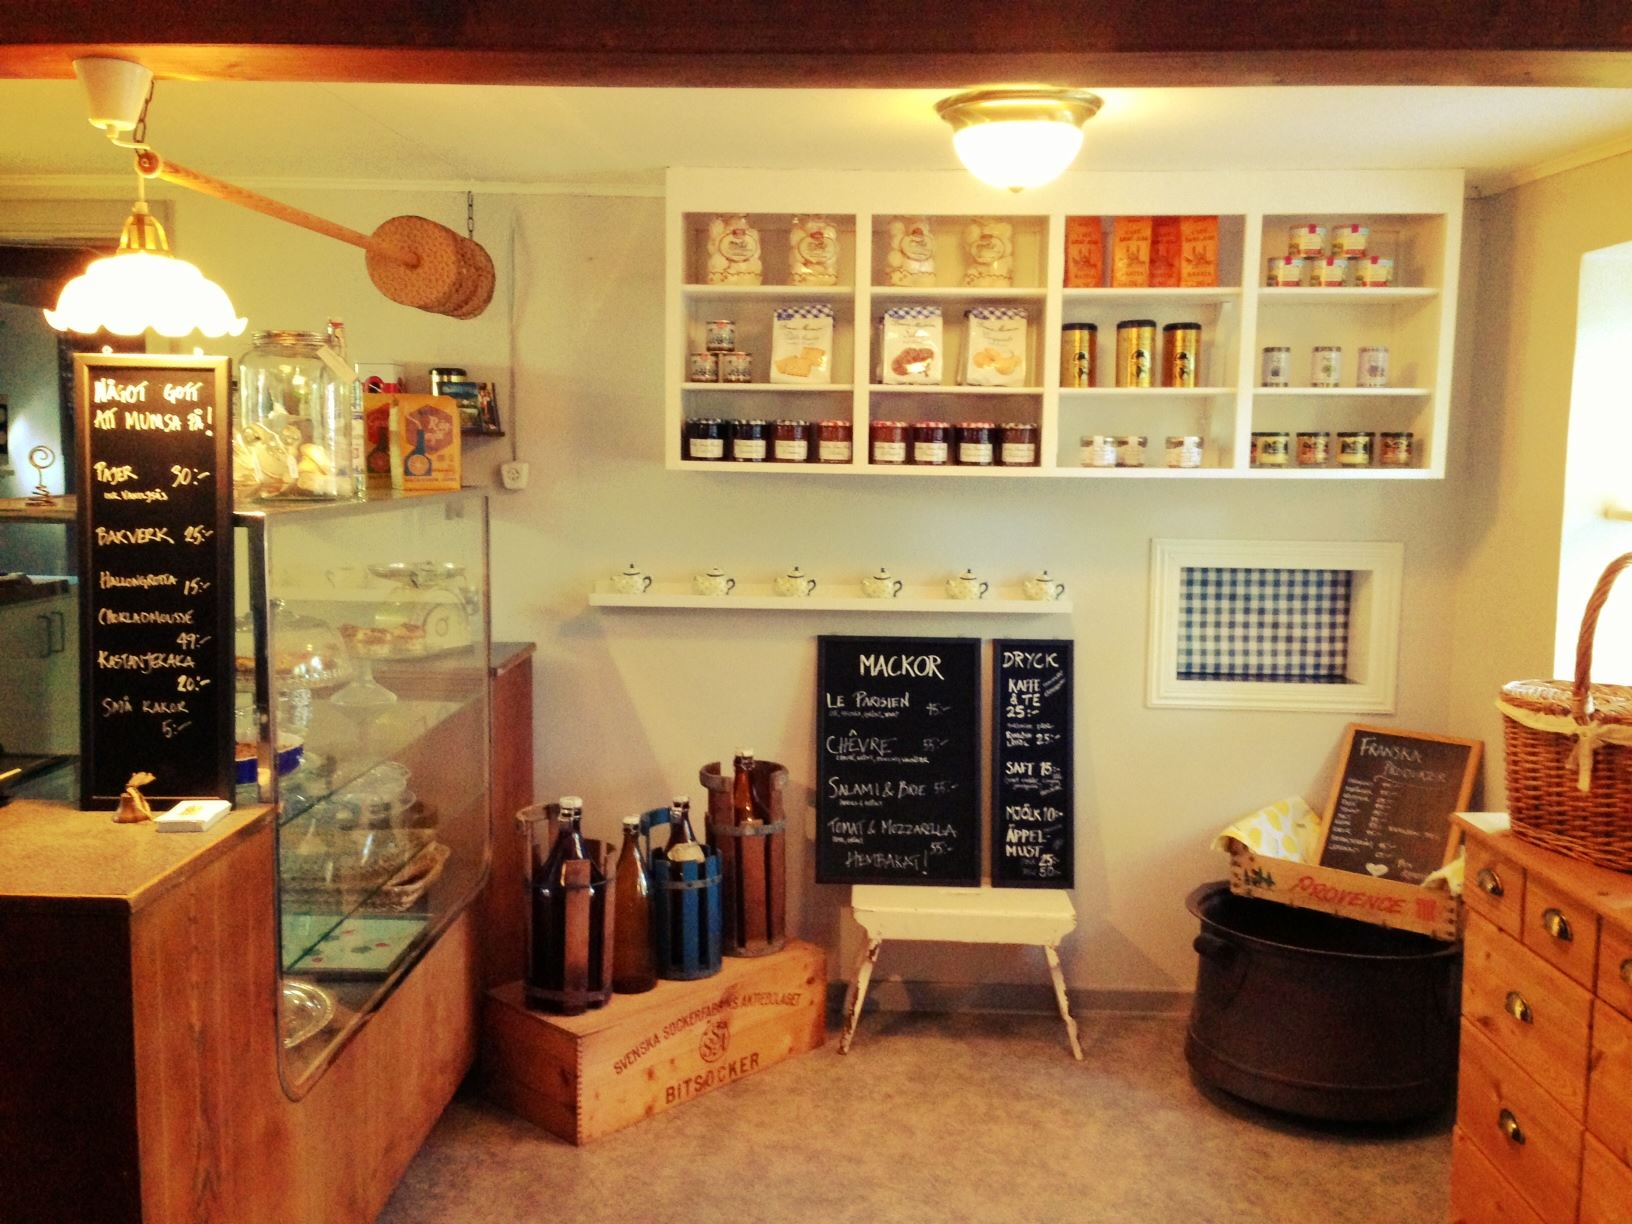 © Café Madame Blå, Café Madame Blå